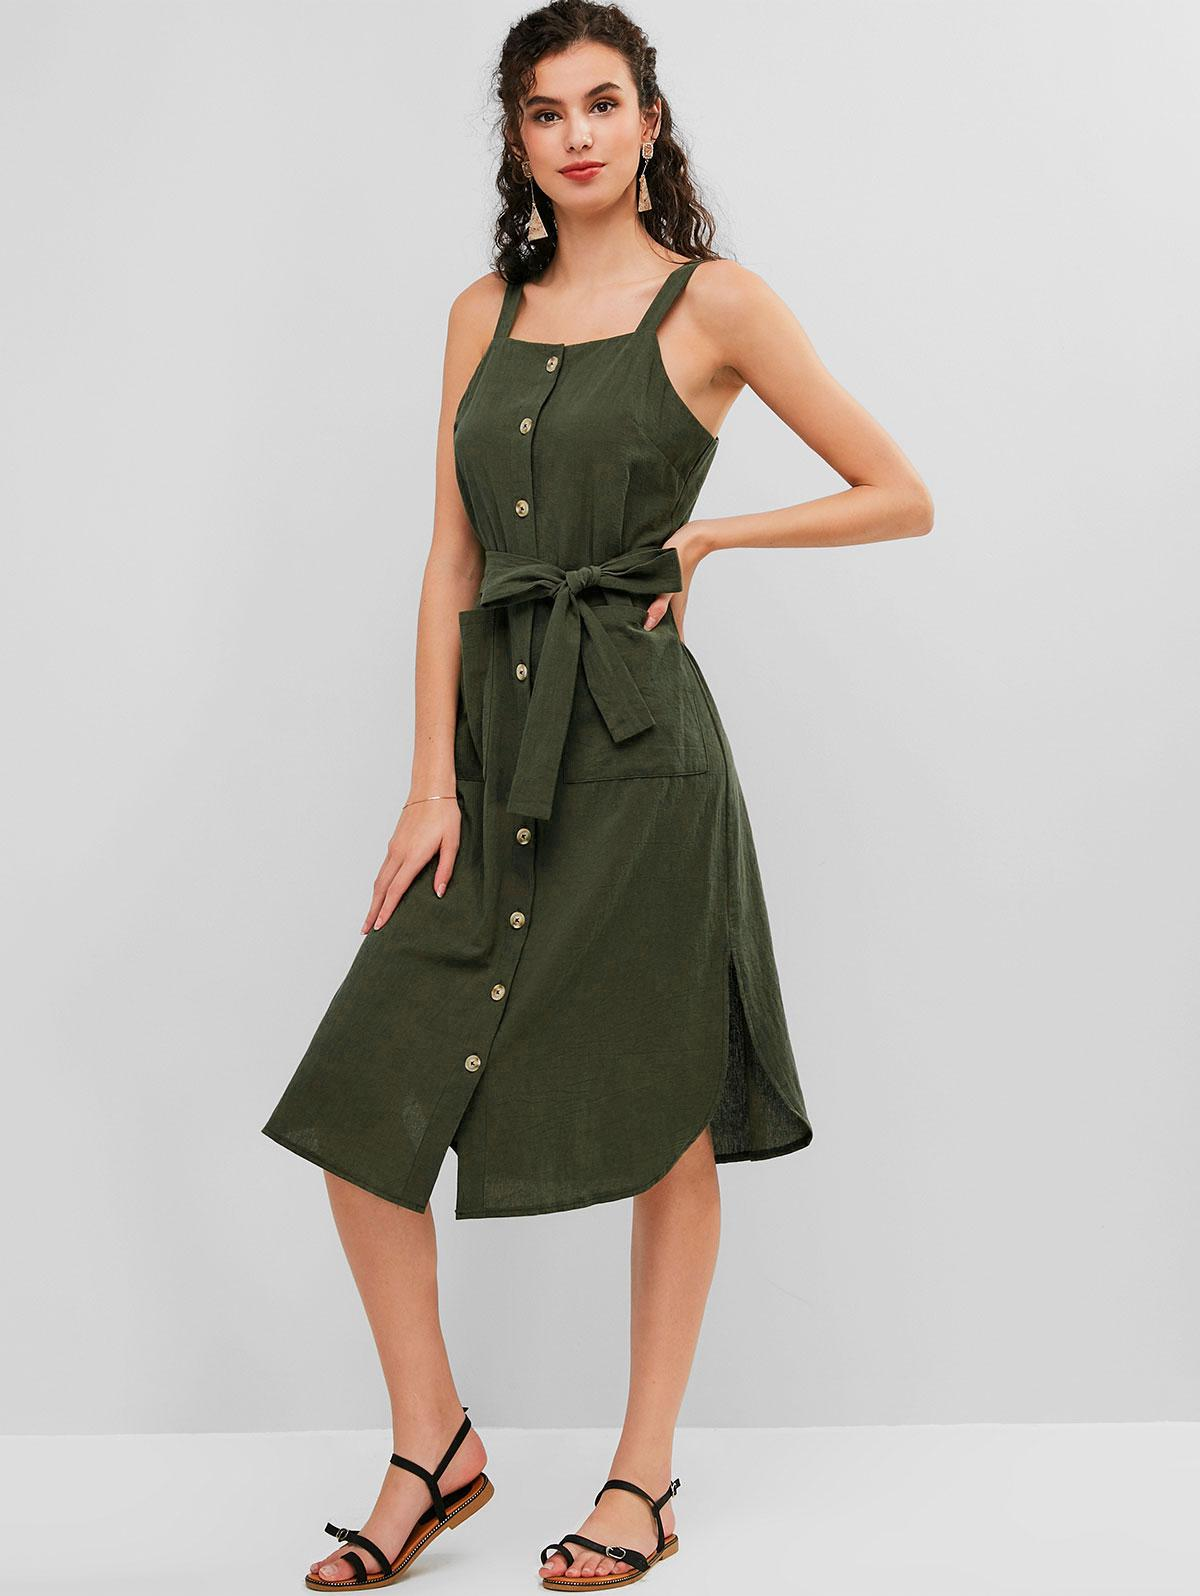 ZAFUL Button Up Pocket Belted Slit Dress, Army green